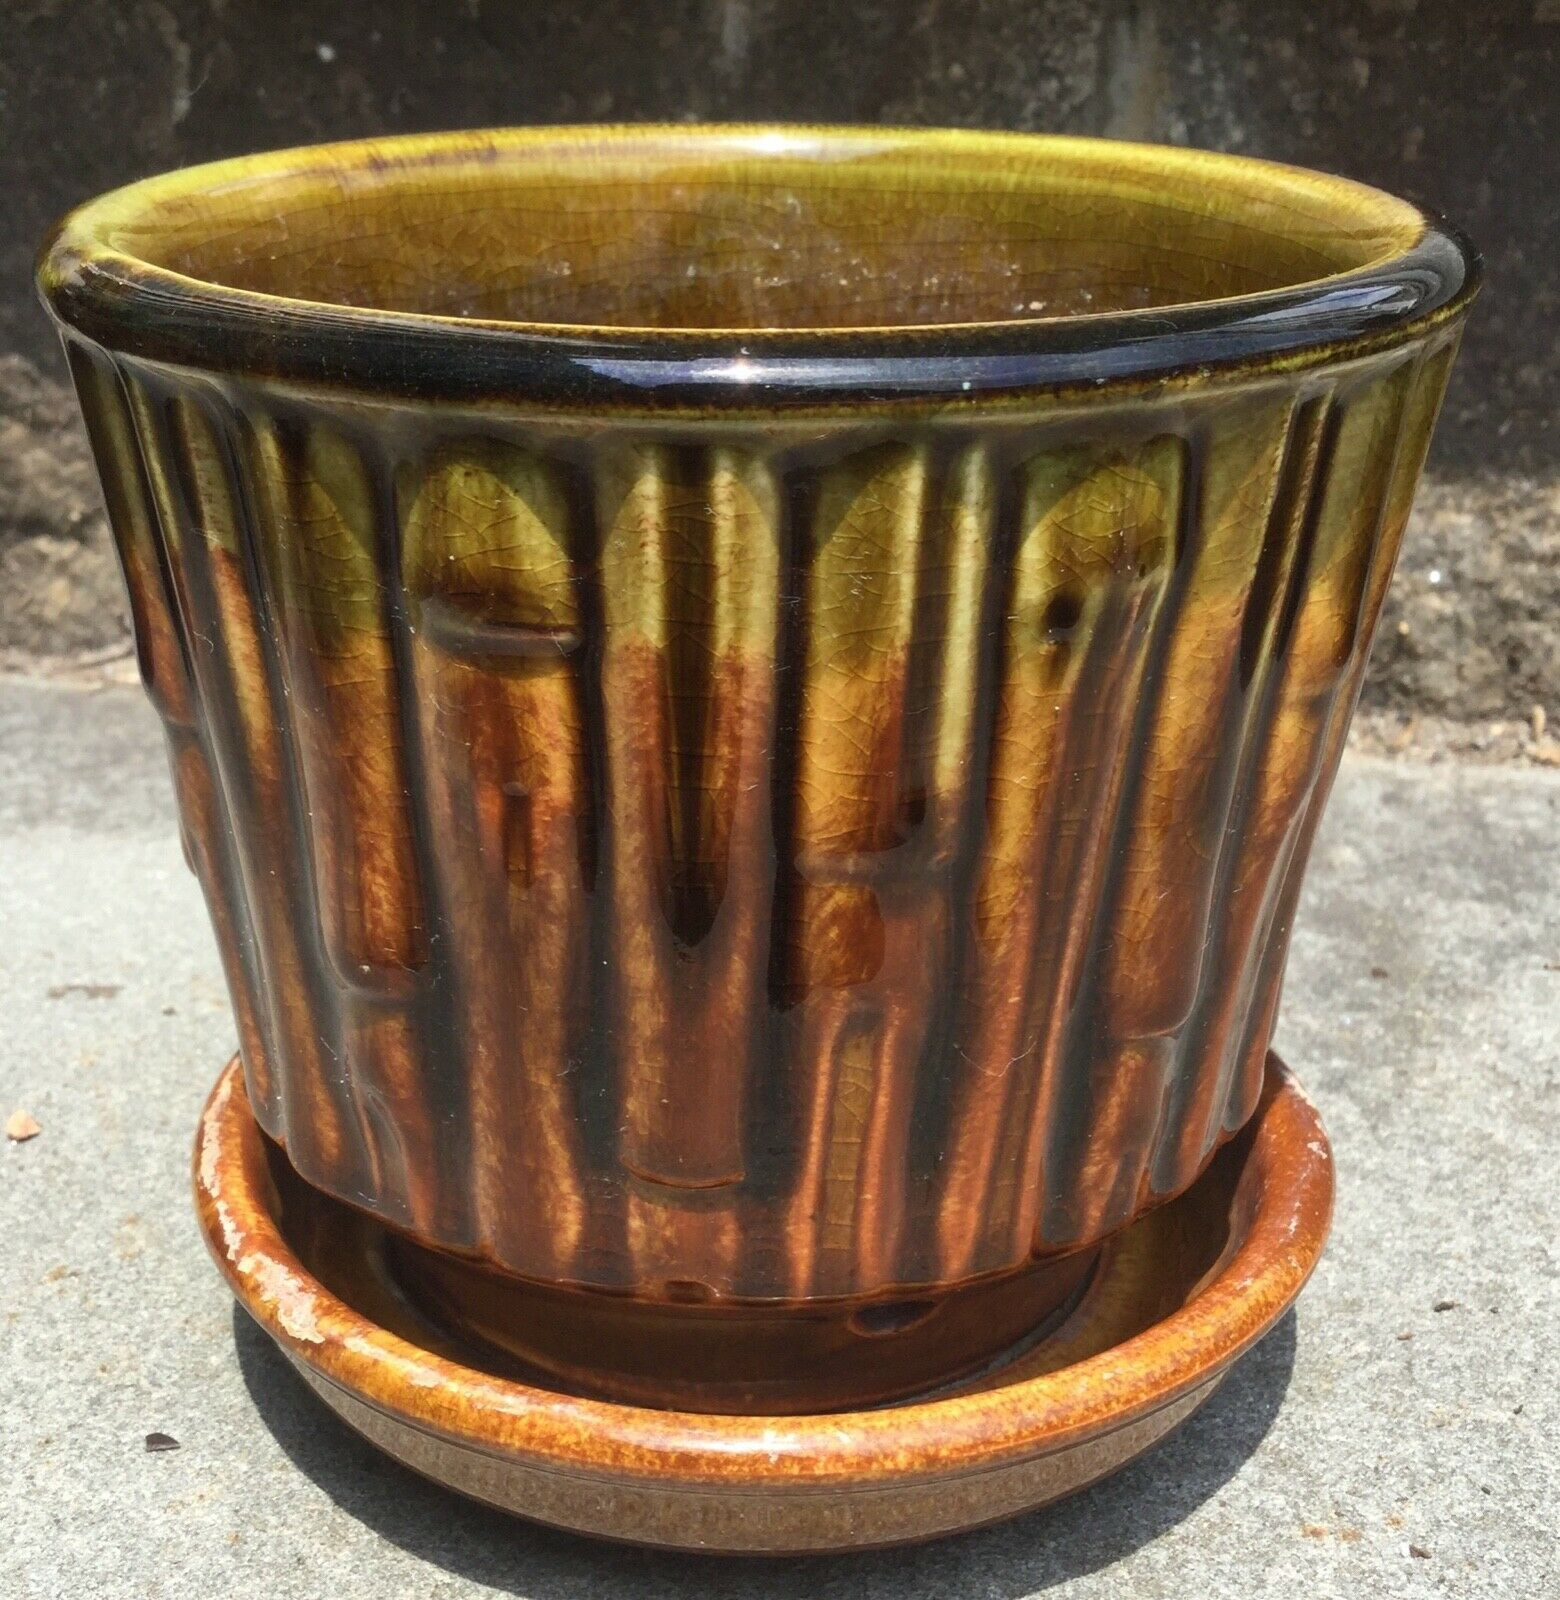 Vintage Mccoy Bamboo 0372 Planter 4 1 4 Tall Flower Pot With Saucer Ebay Tall Flowers Planters Flower Pots